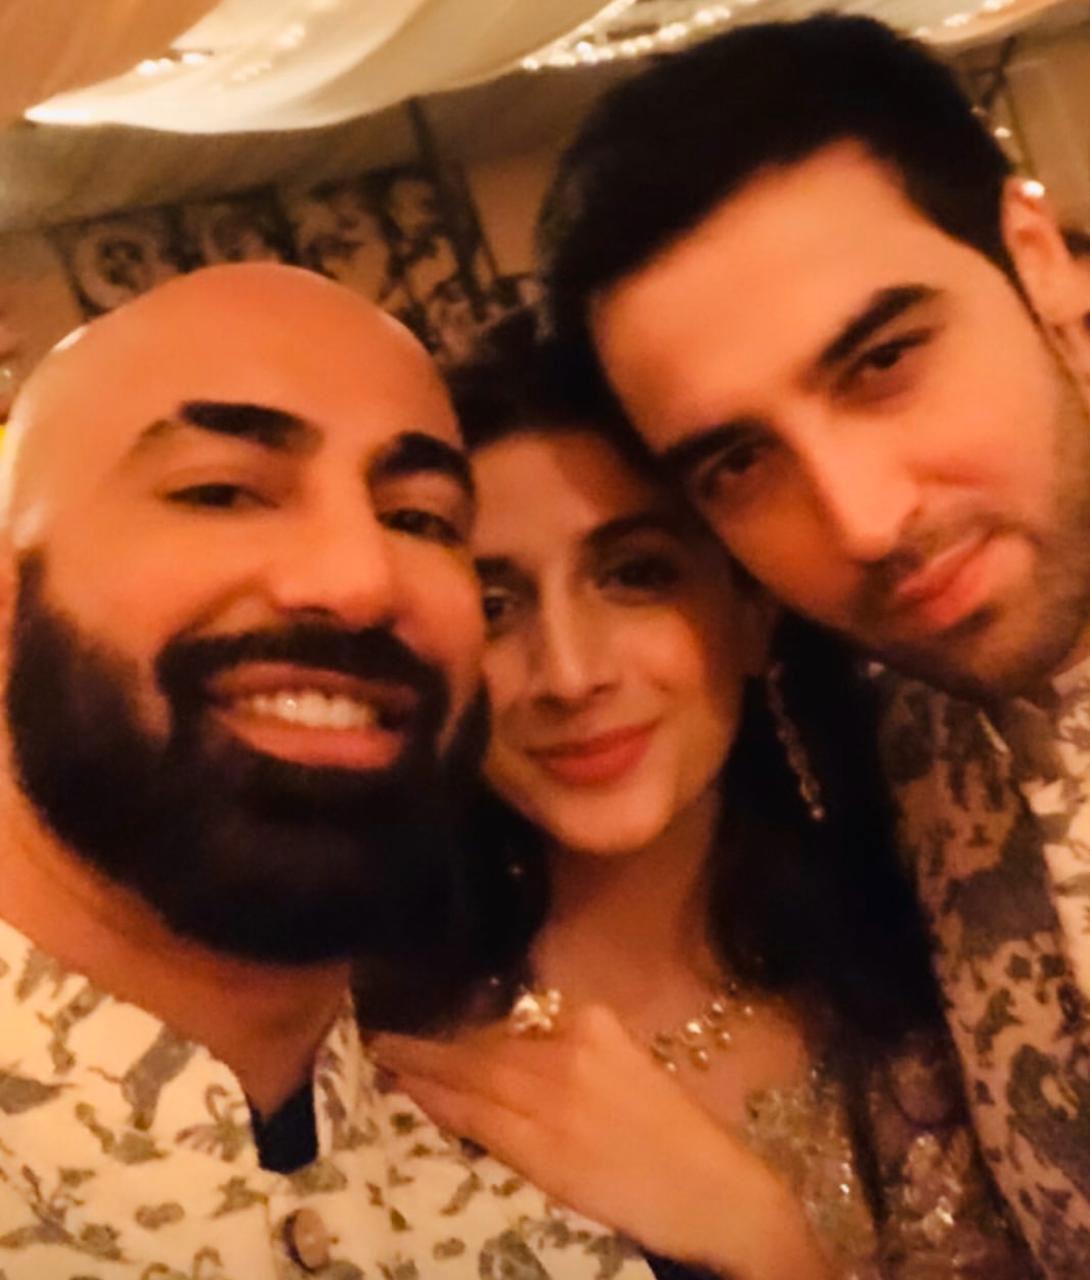 Mahira Khan, Sharmeen Obaid Chinoy, Mawra Hocane Dazzle at a Wedding